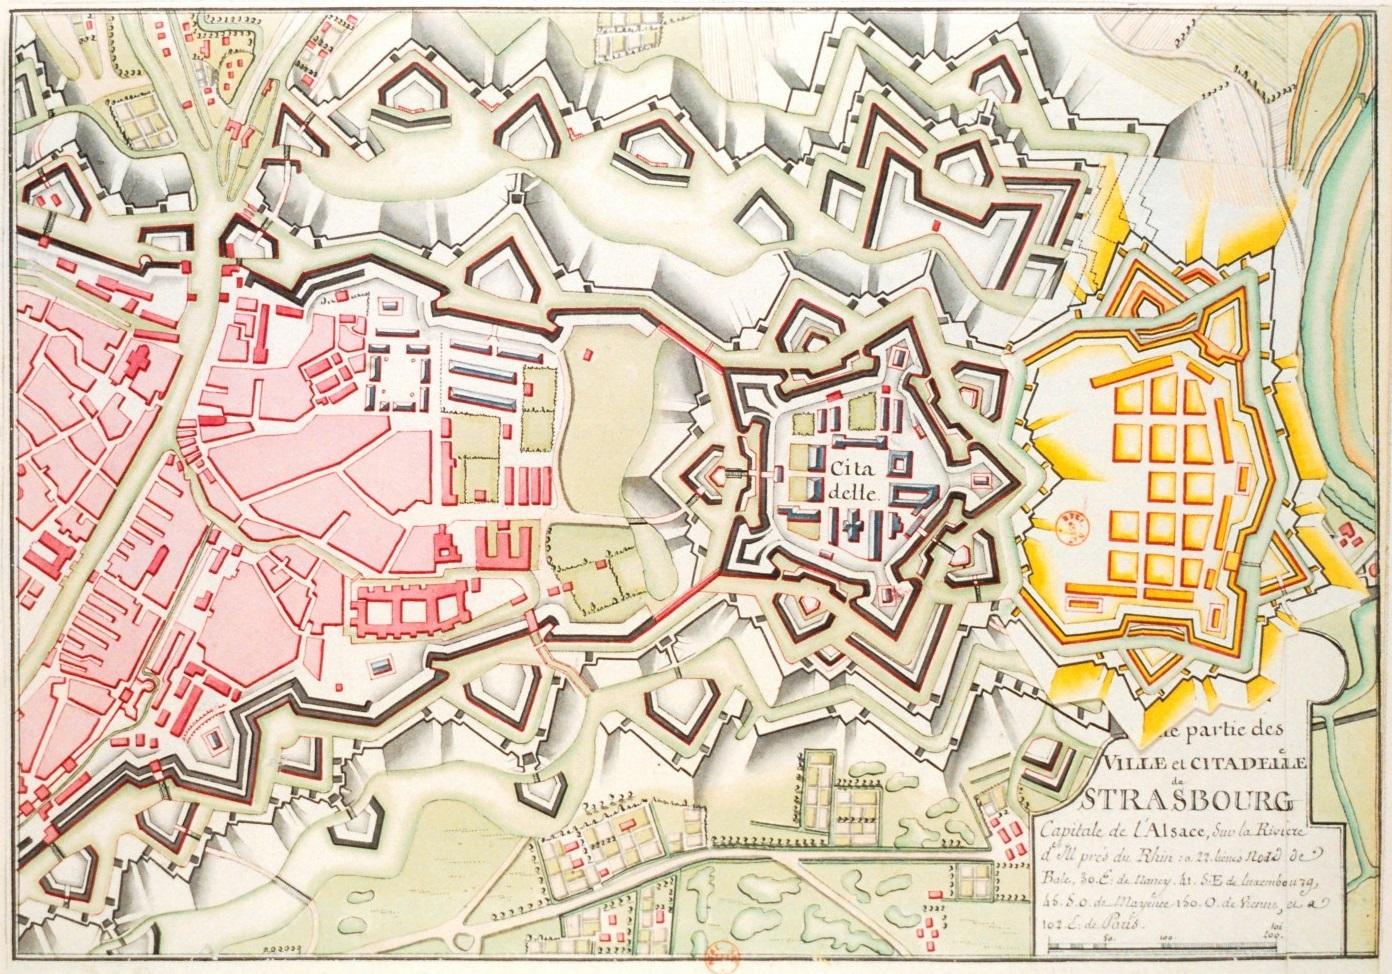 Brève histoire de la Citadelle de Strasbourg